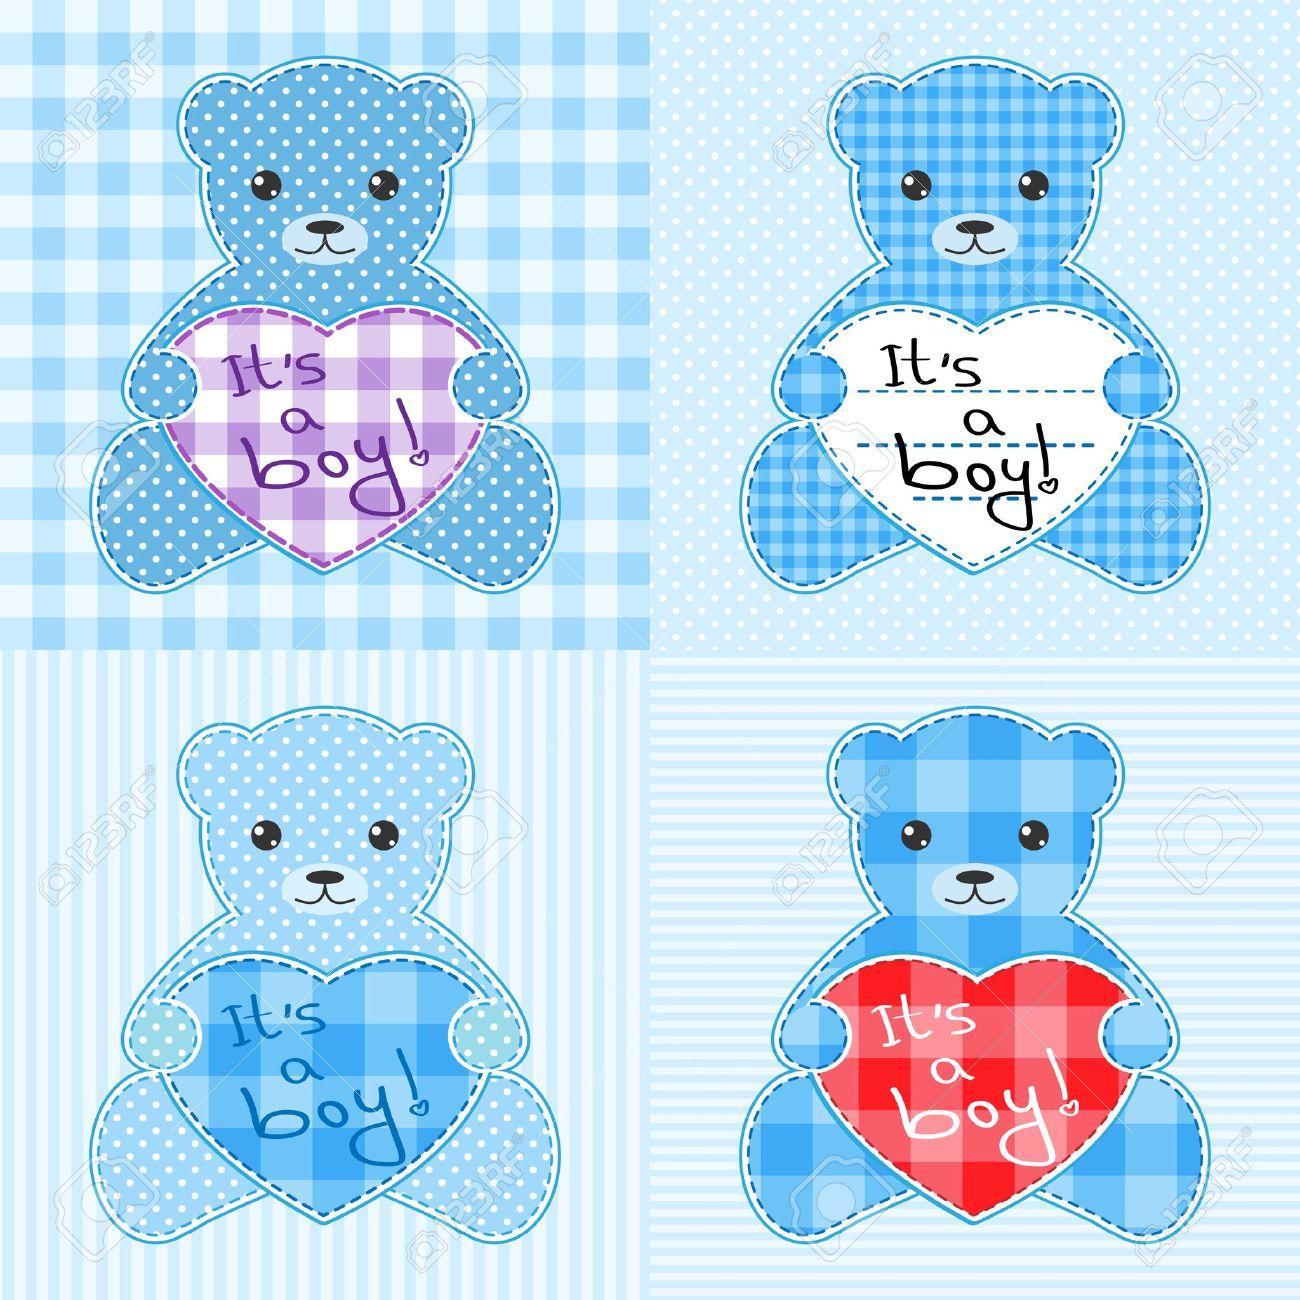 Boy With Teddy Bear Blue Teddy Bears For Boy